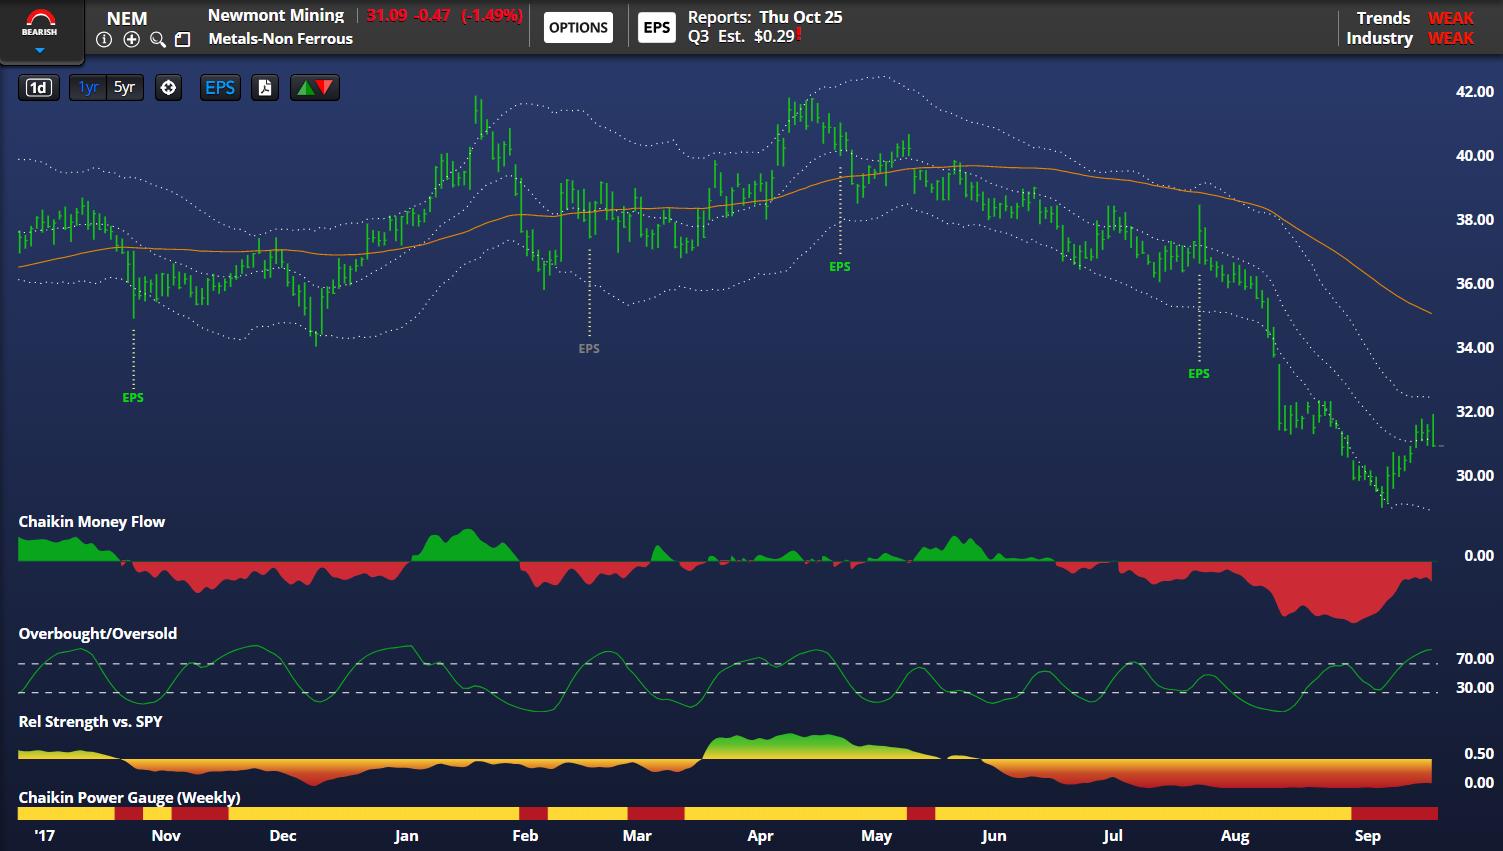 newmont mining stock chart analysis metals rally over bearish_september 26